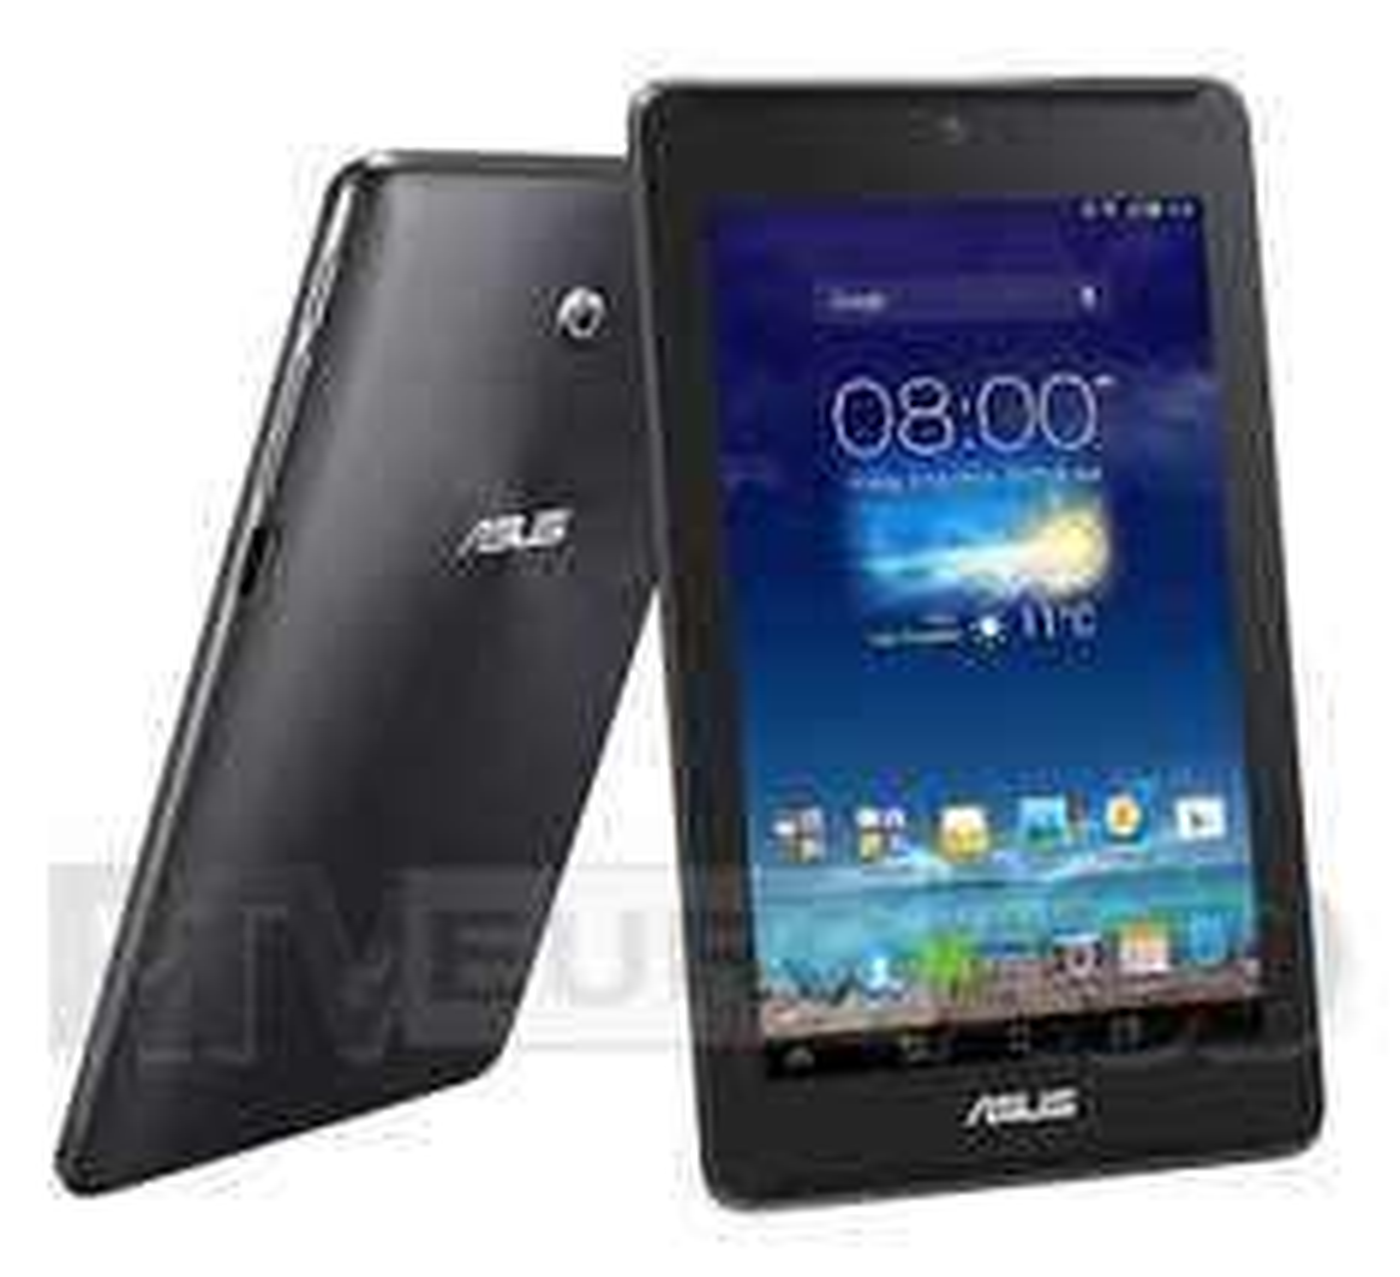 Asus Fonepad 7 ME372CL (czarny) za 499zł @ Euro